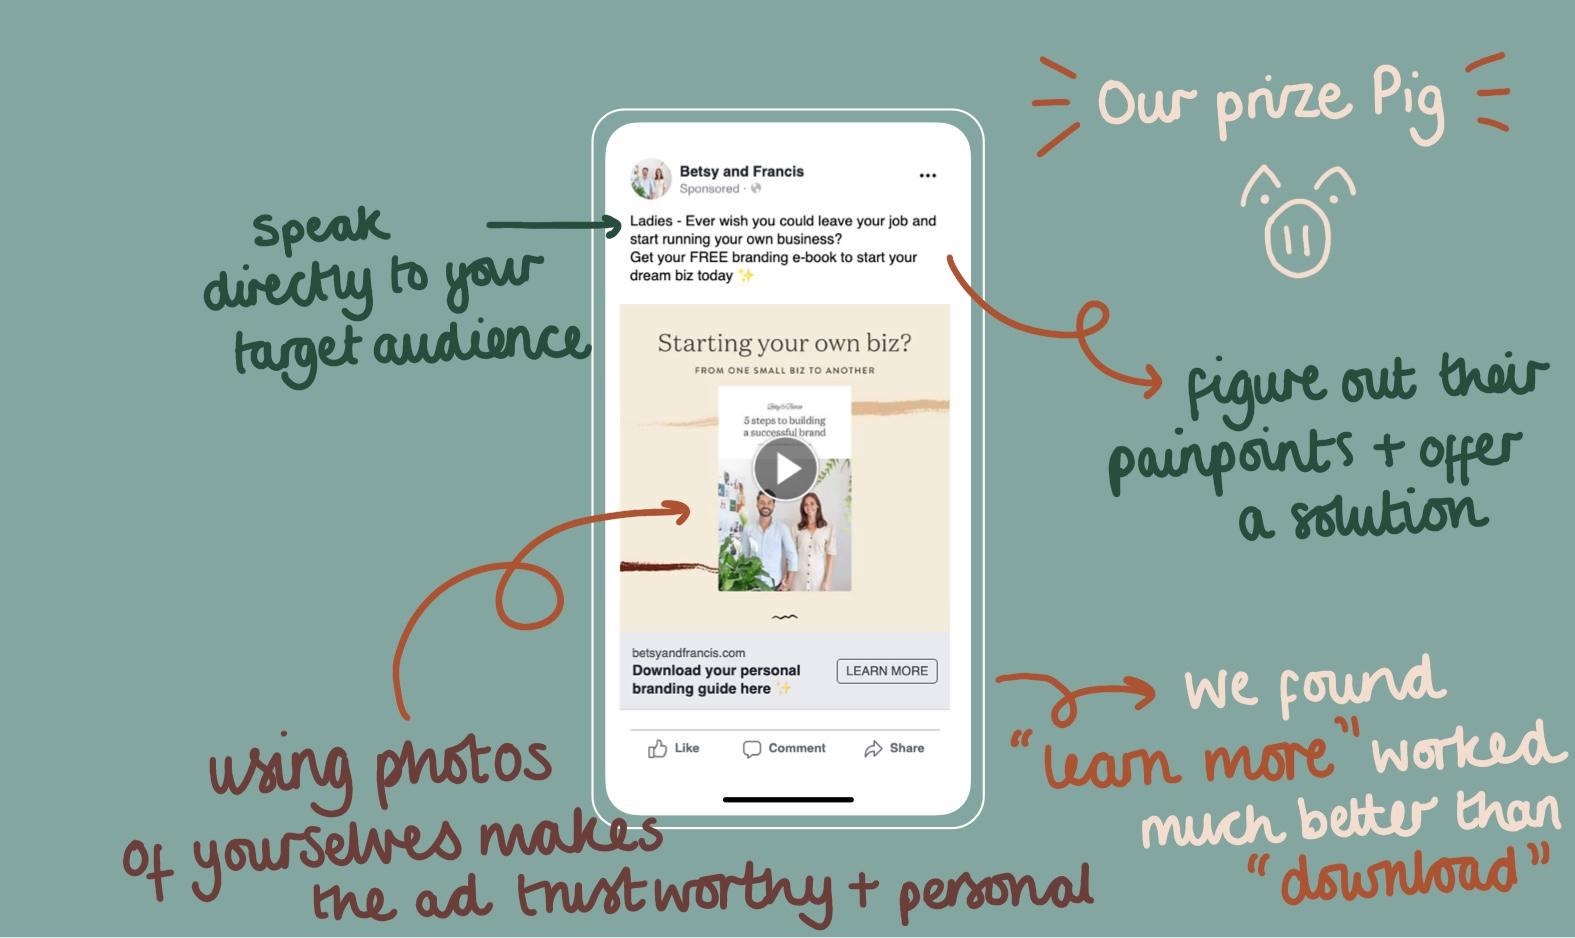 Betsy-and-francis-design-agency-facebook-ads-help-sydney-5.jpg.jpg